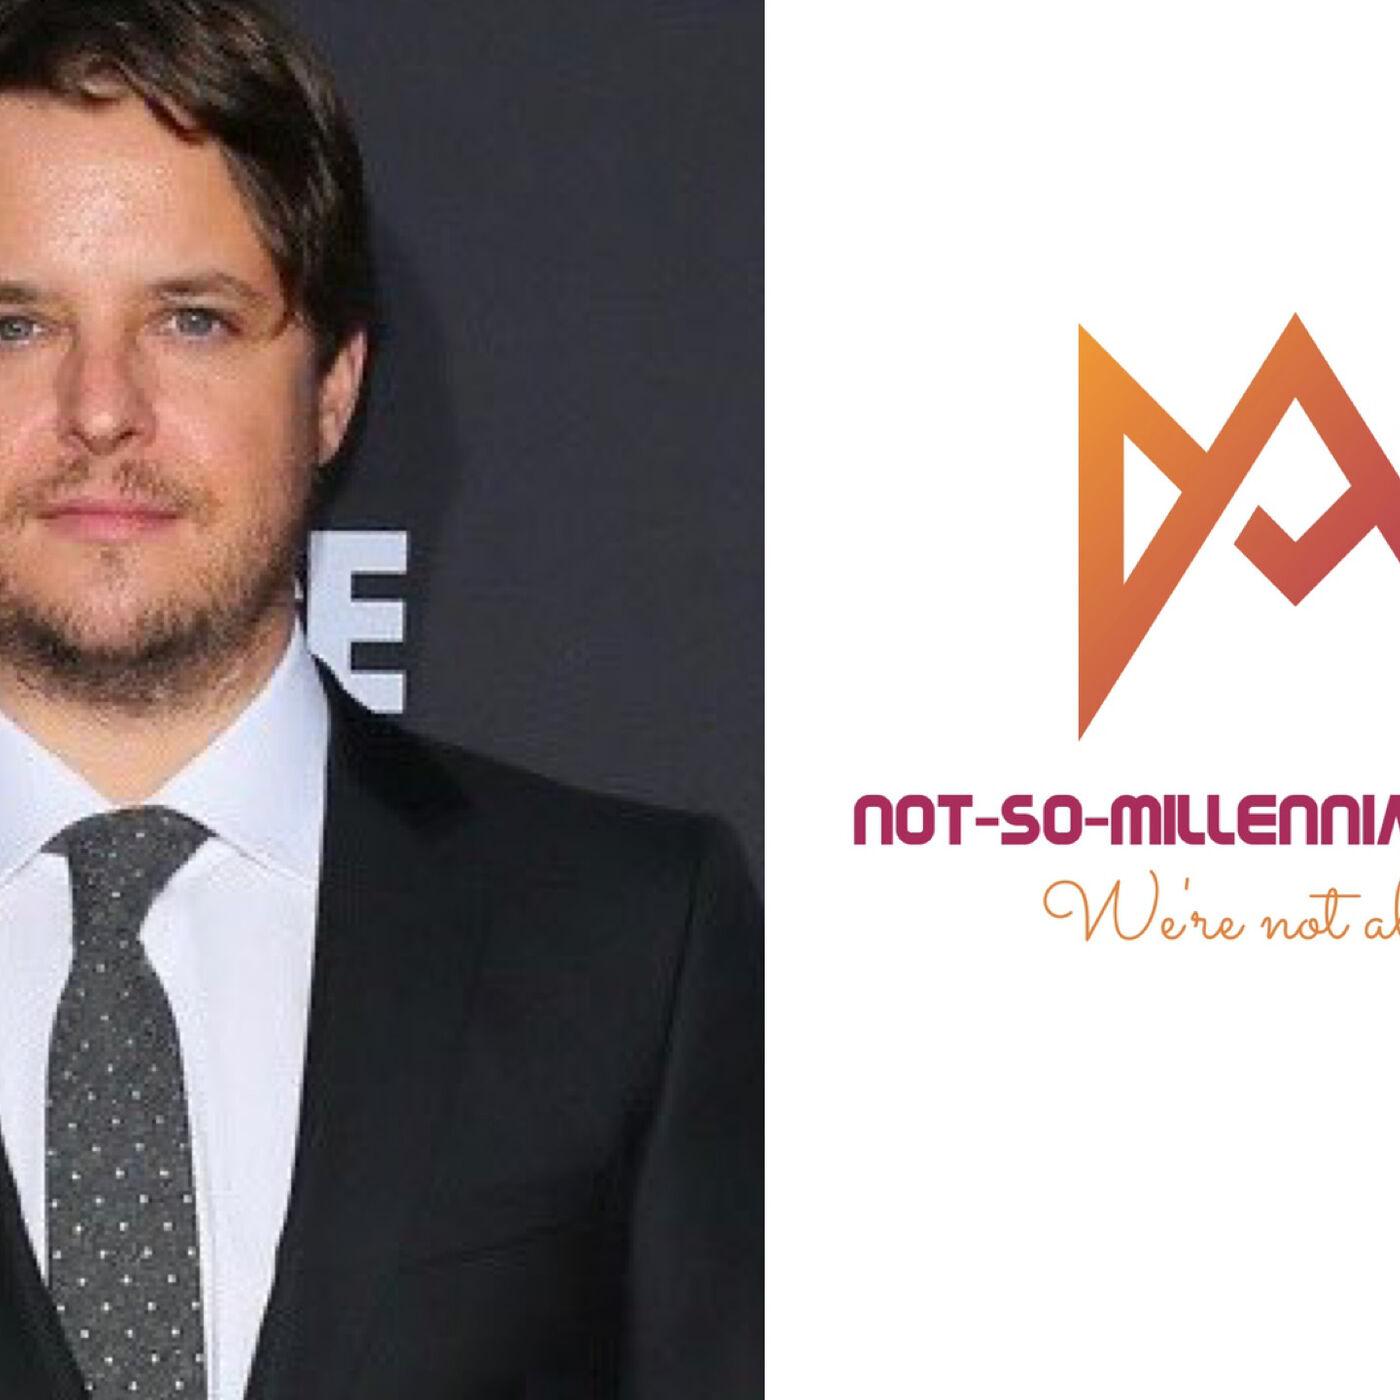 Not-So-Millennial Host Interviews the Creator of Netflix's Kingdom, Byron Balasco - Season 2 Ep. 9